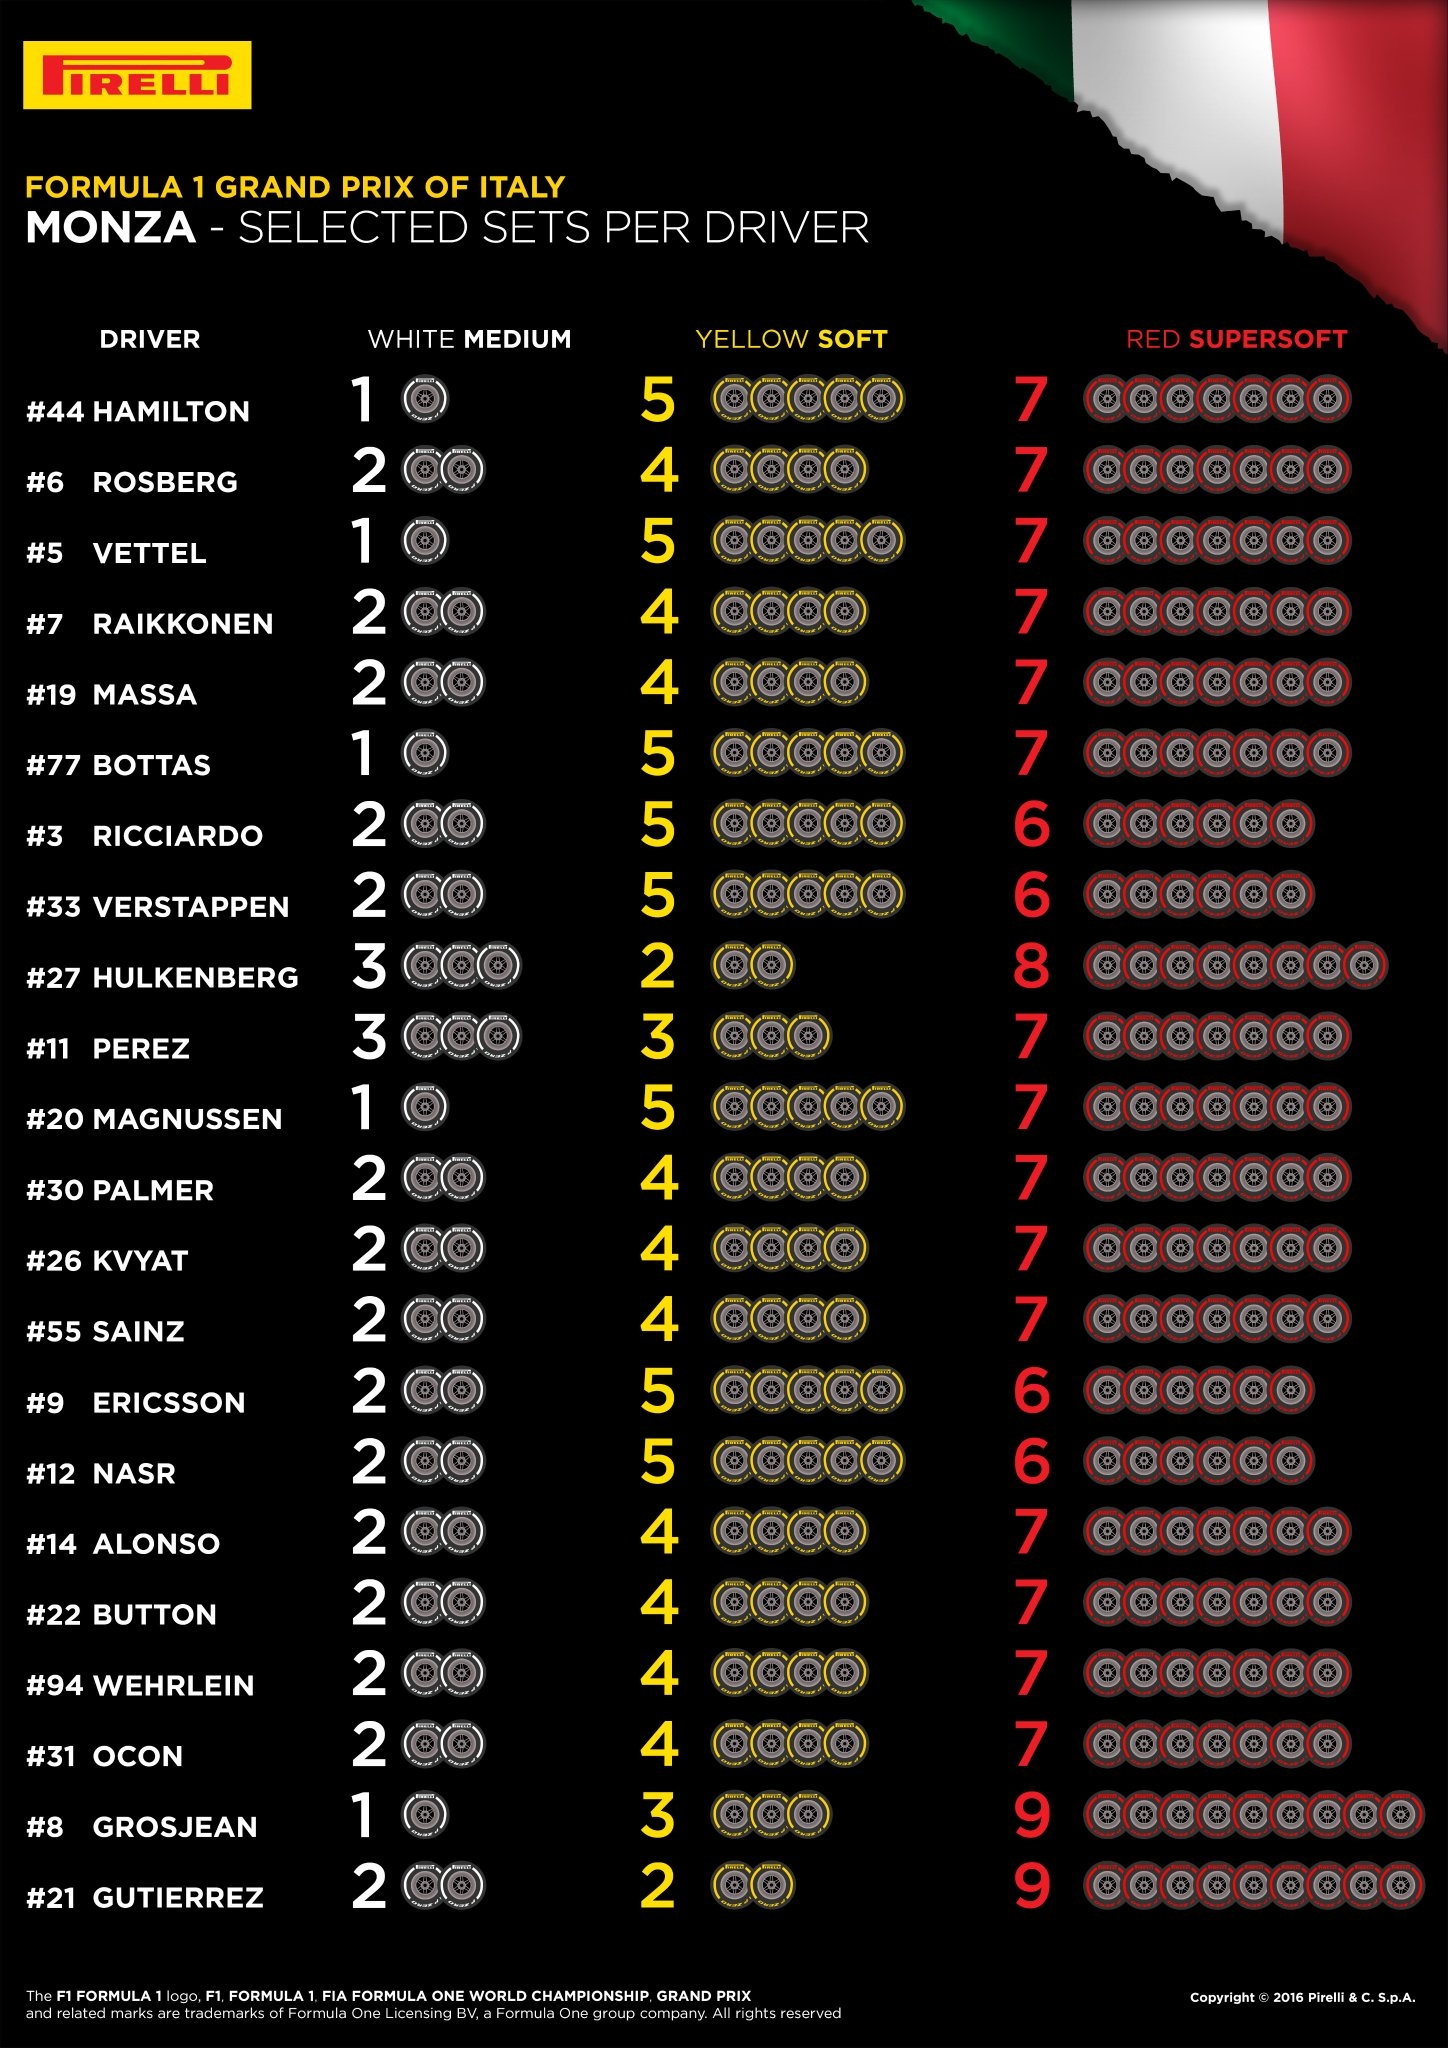 Izbor pnevmatik dirkači Velika nagrada Italije